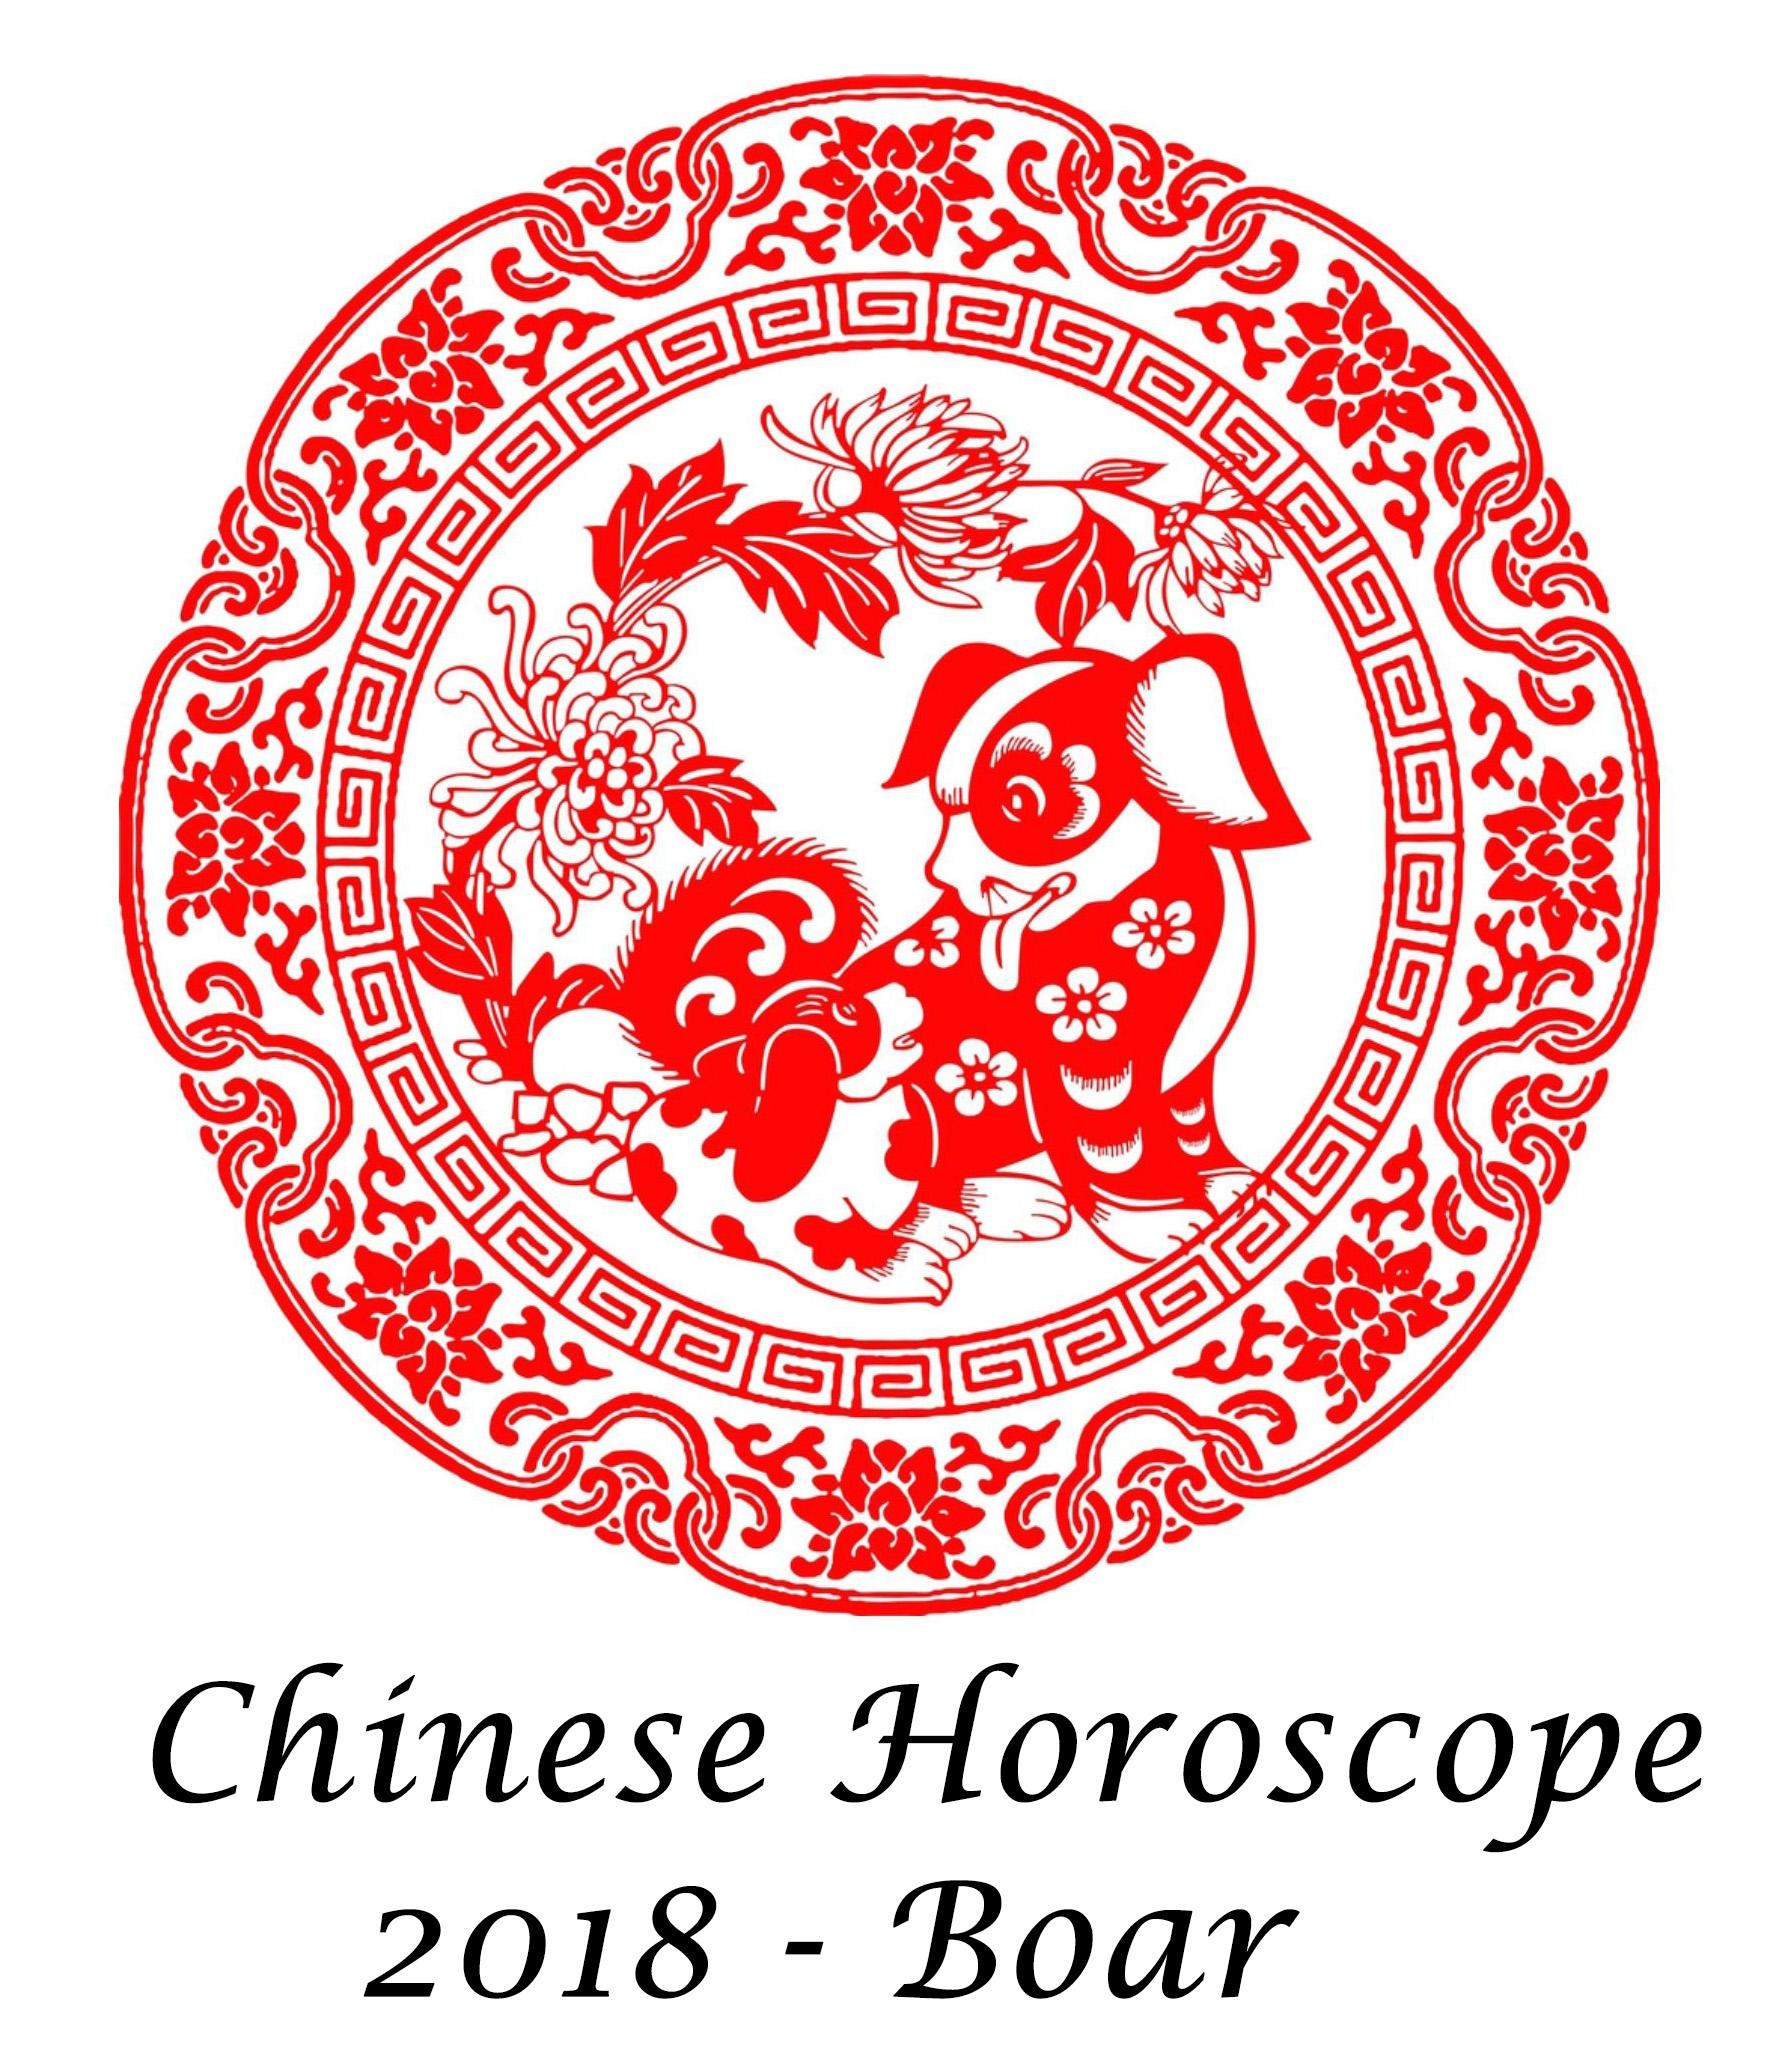 Chinese Horoscope Boar 2018